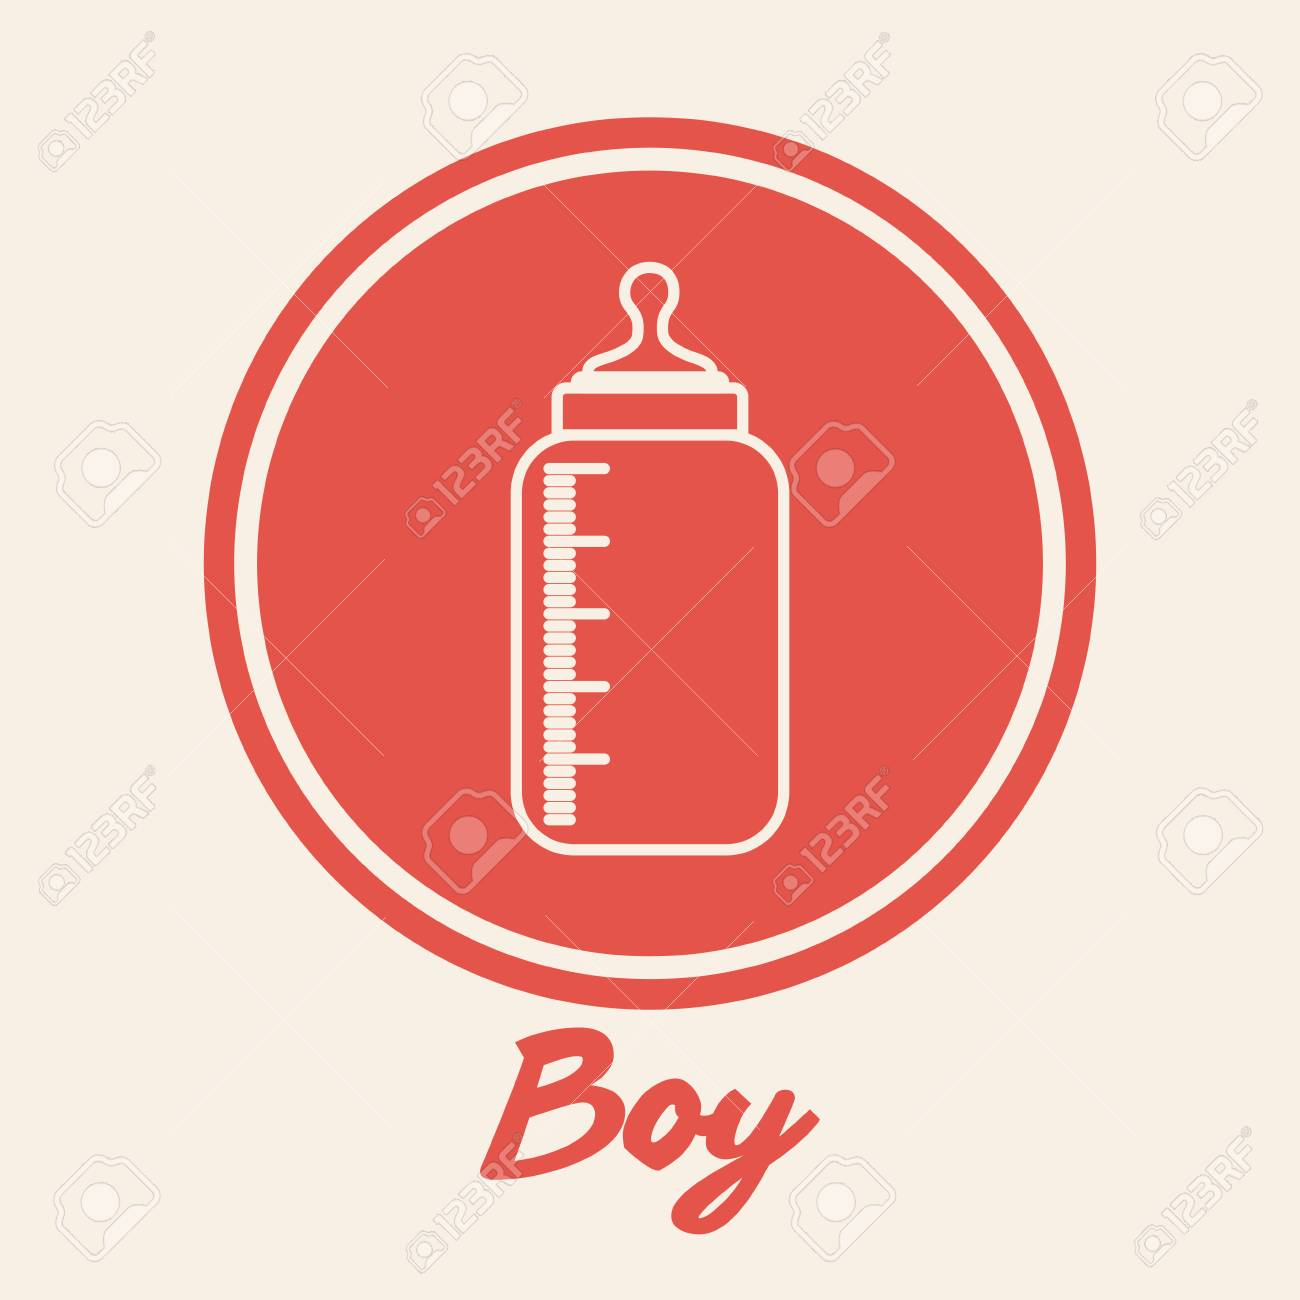 Baby Shower Invitation Design, Vector Illustration Eps10 Graphic ...